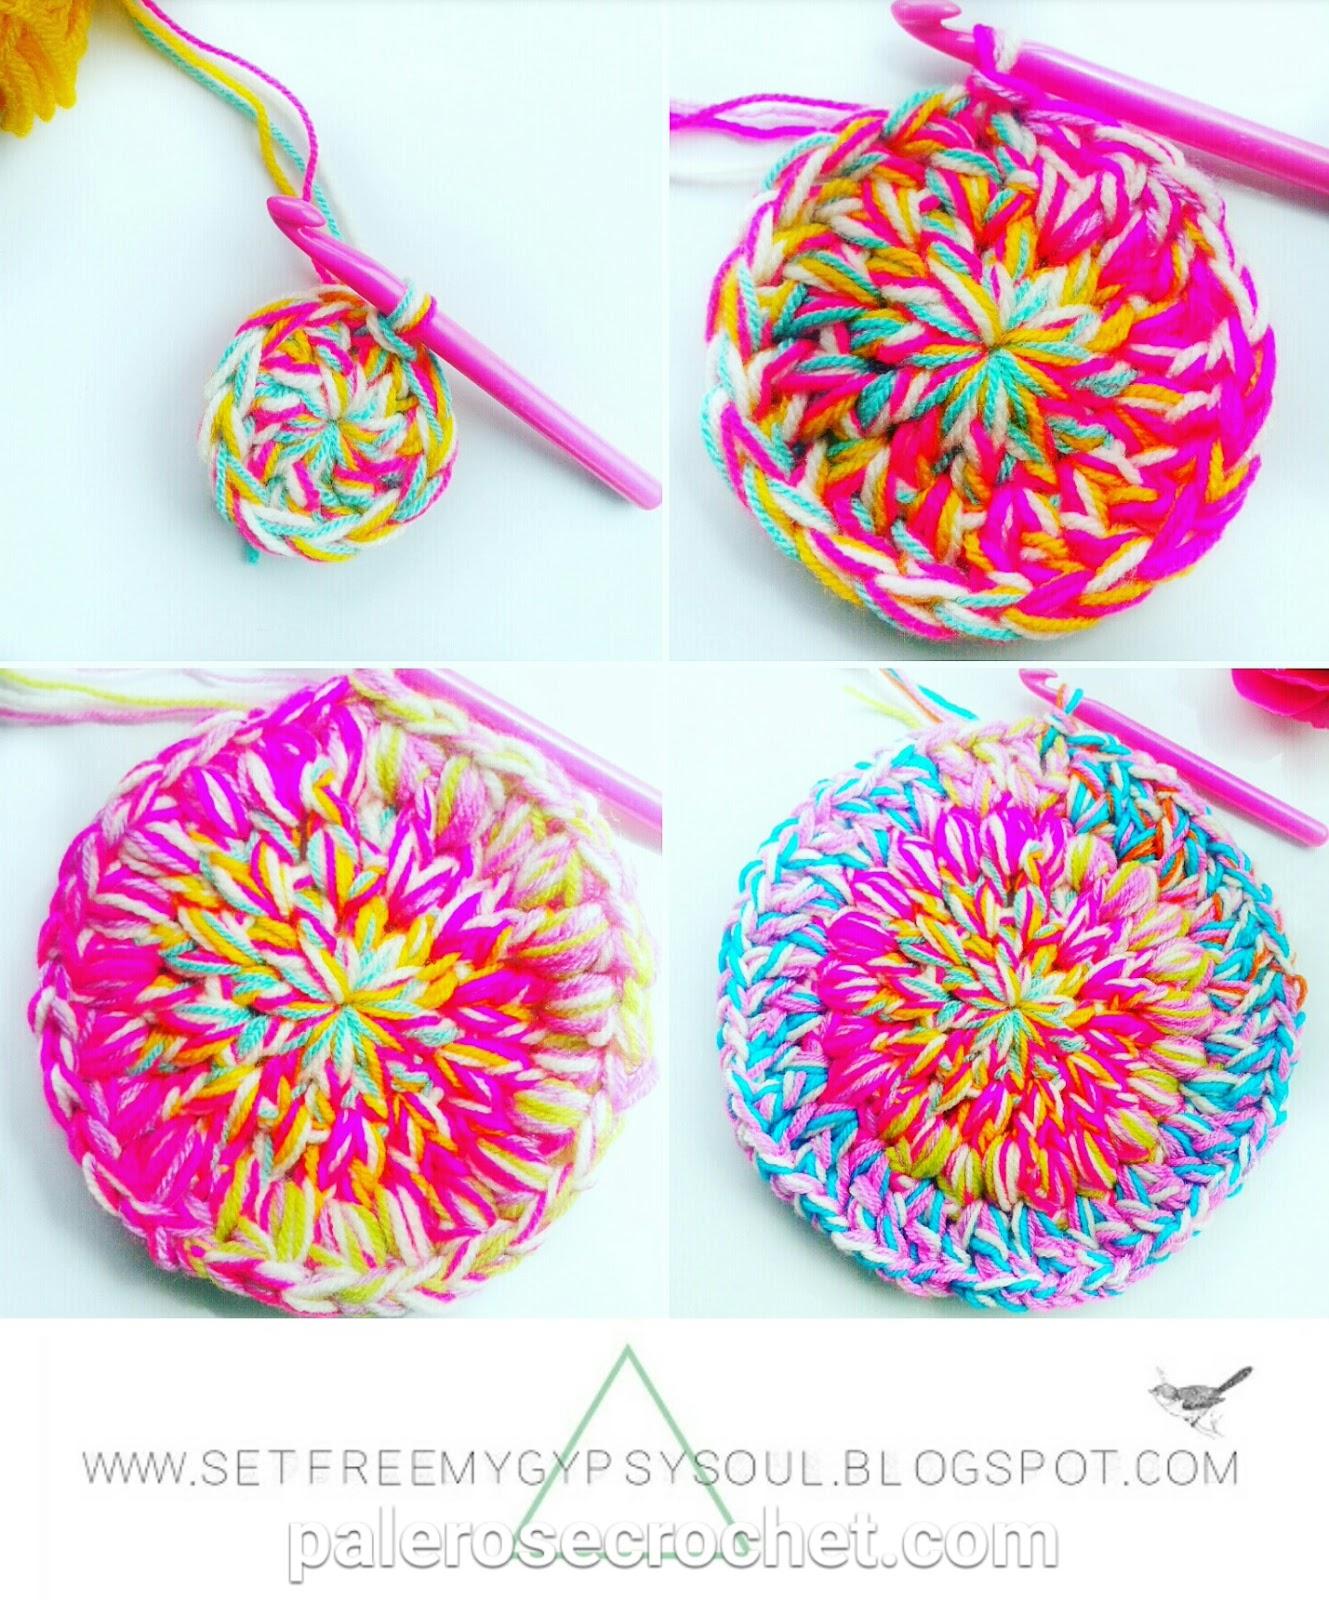 Crochet Patterns Using Mandala Yarn : Busting Crochet Doily Rug and DIY Unicorn Yarn Free Crochet Pattern ...